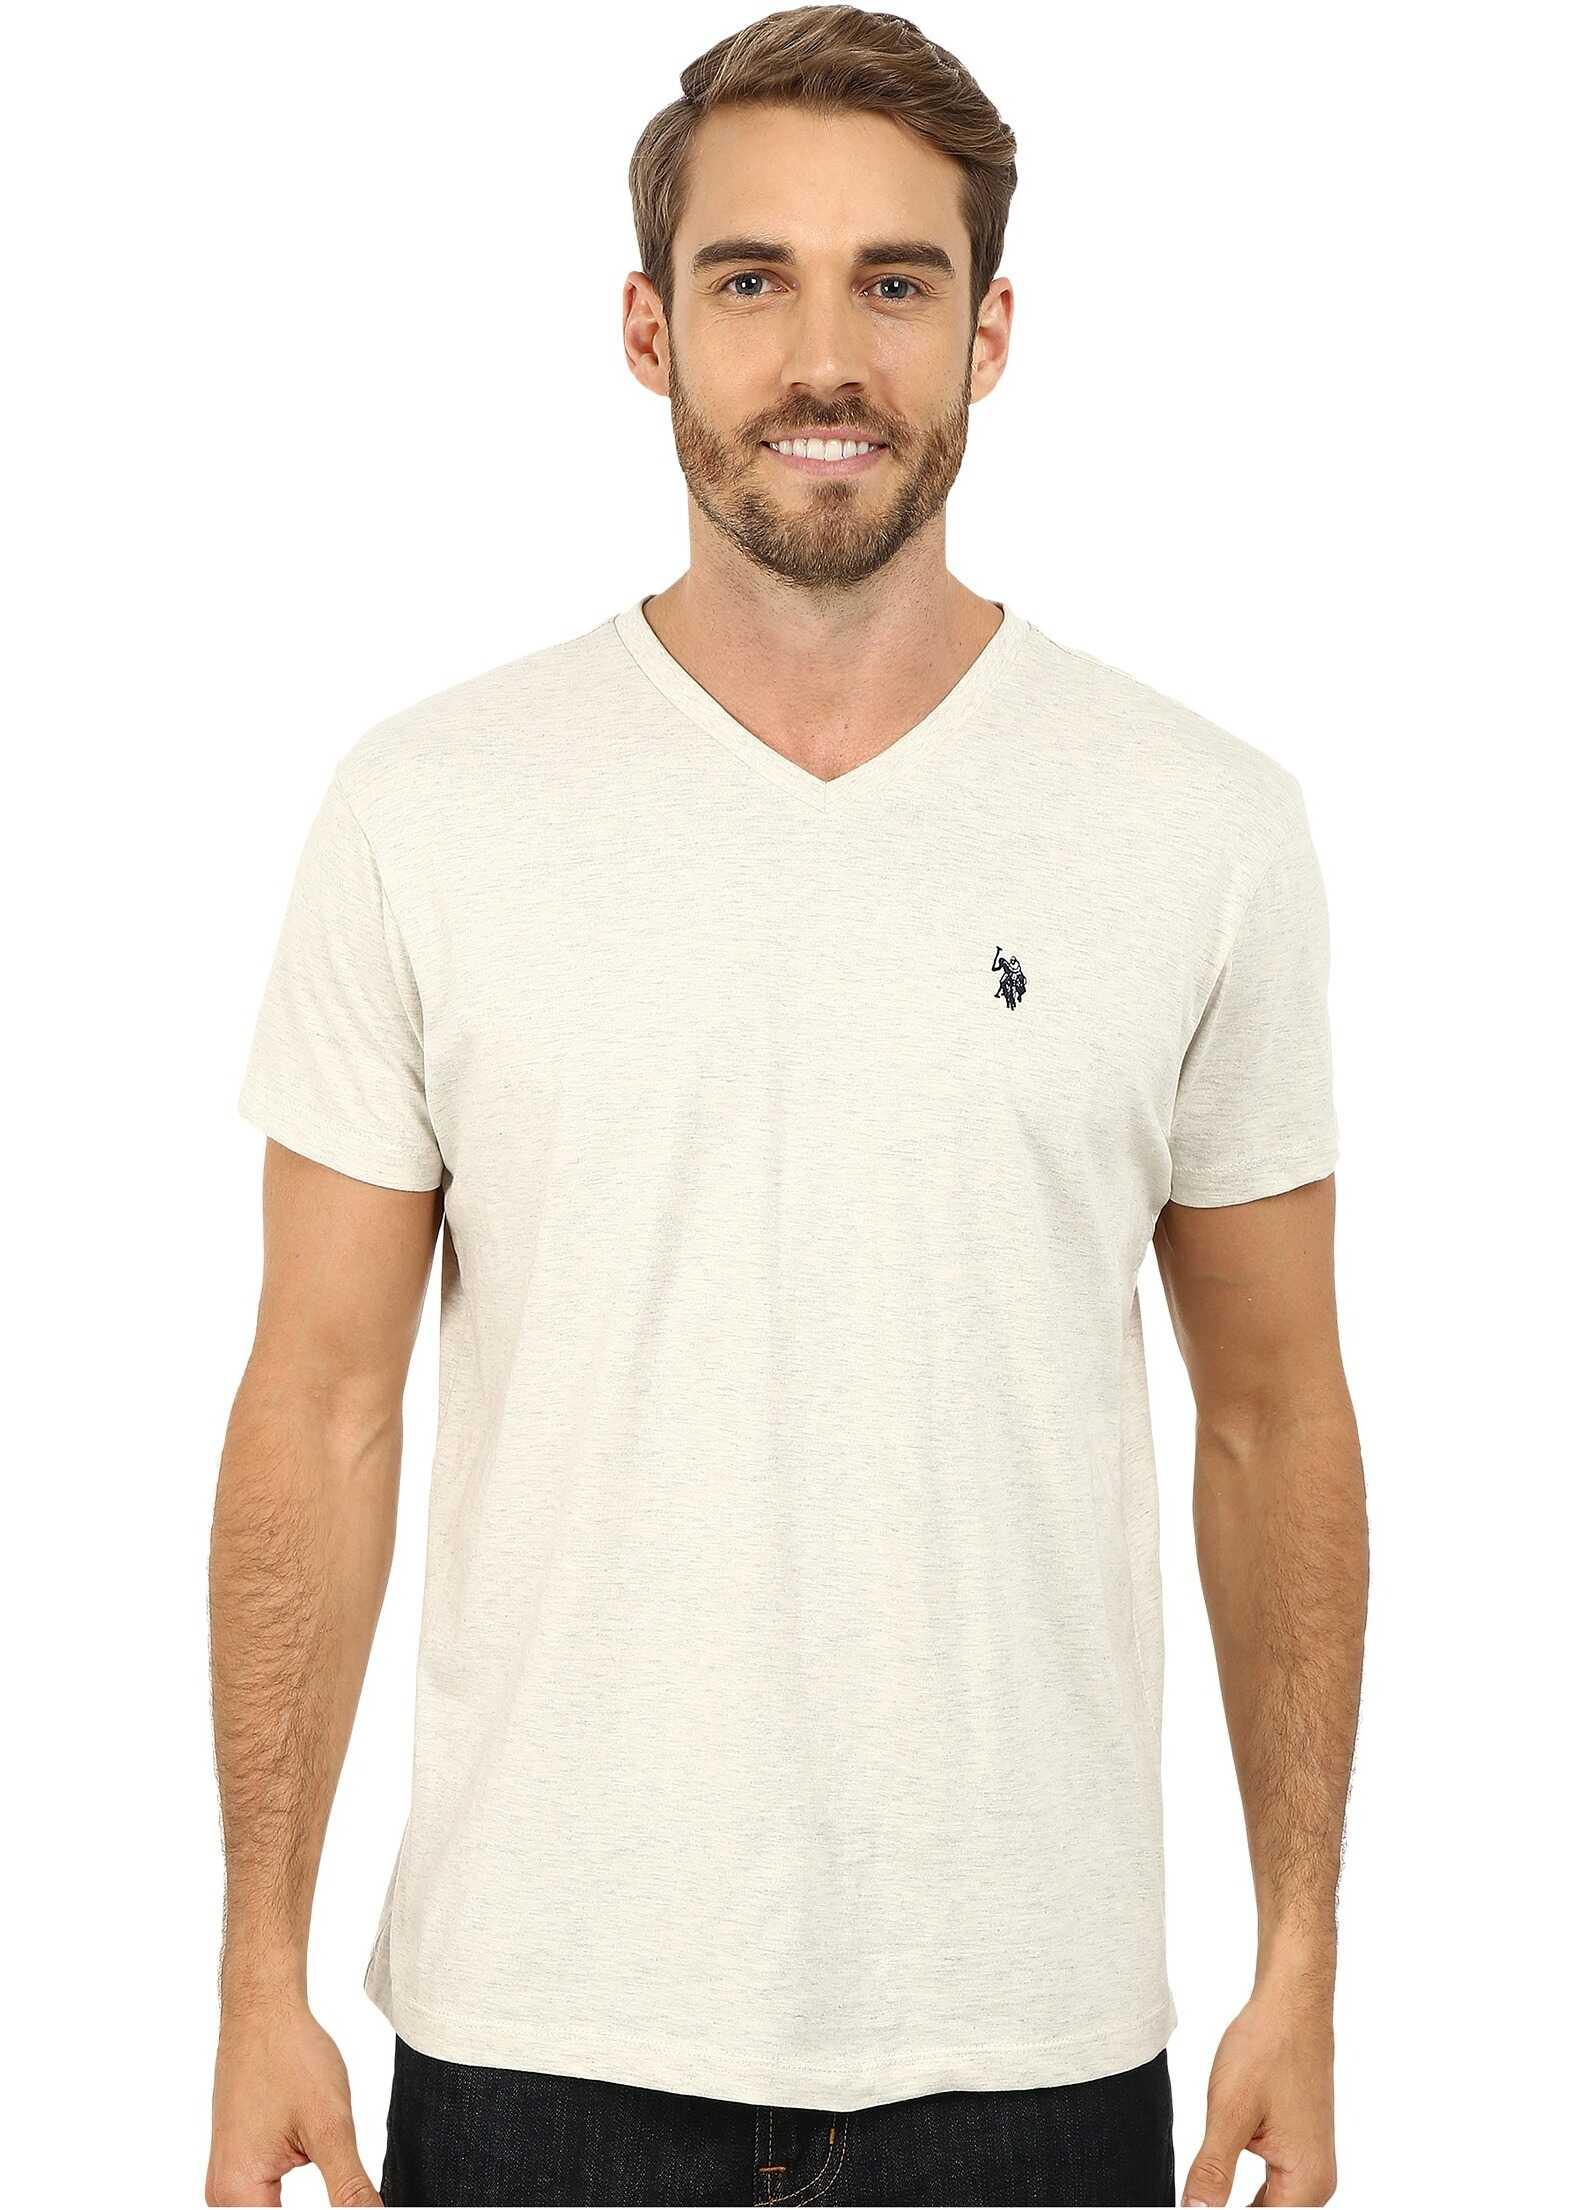 U.S. POLO ASSN. V-Neck Short Sleeve T-Shirt Oatmeal Heather